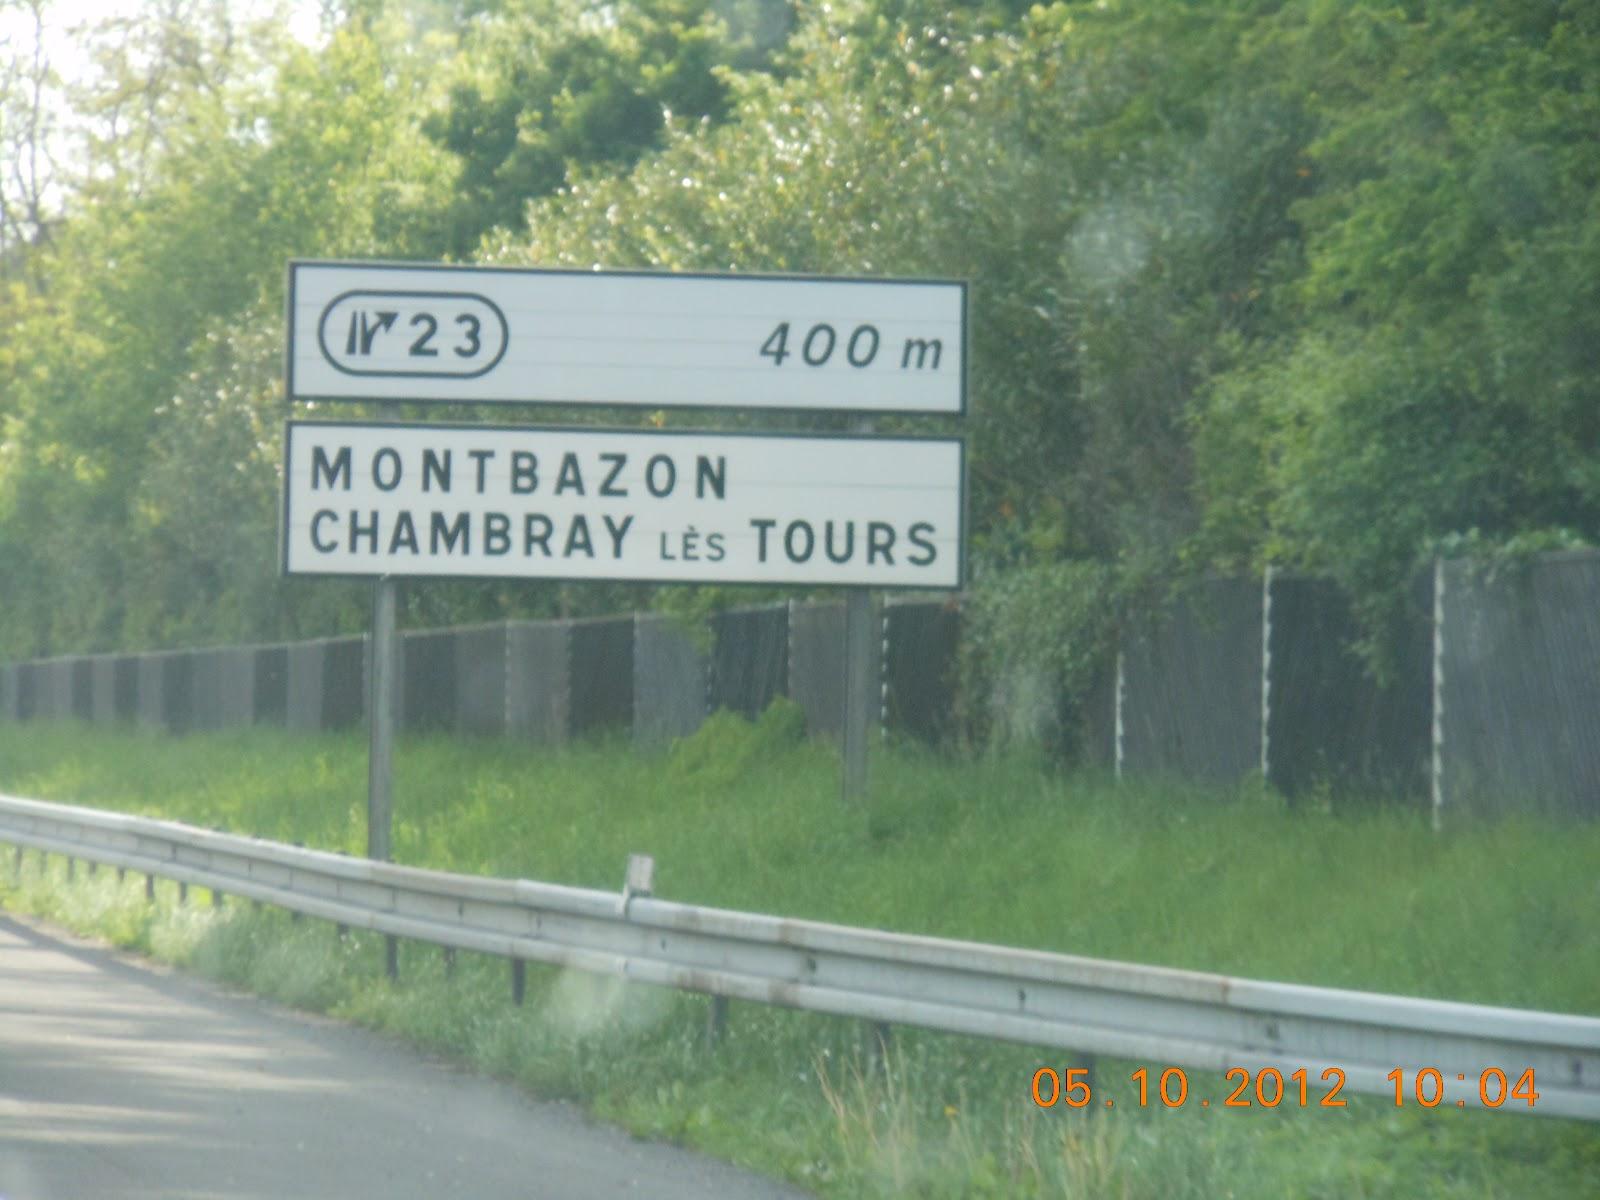 chateau dartigny - Chateau D Artigny Mariage